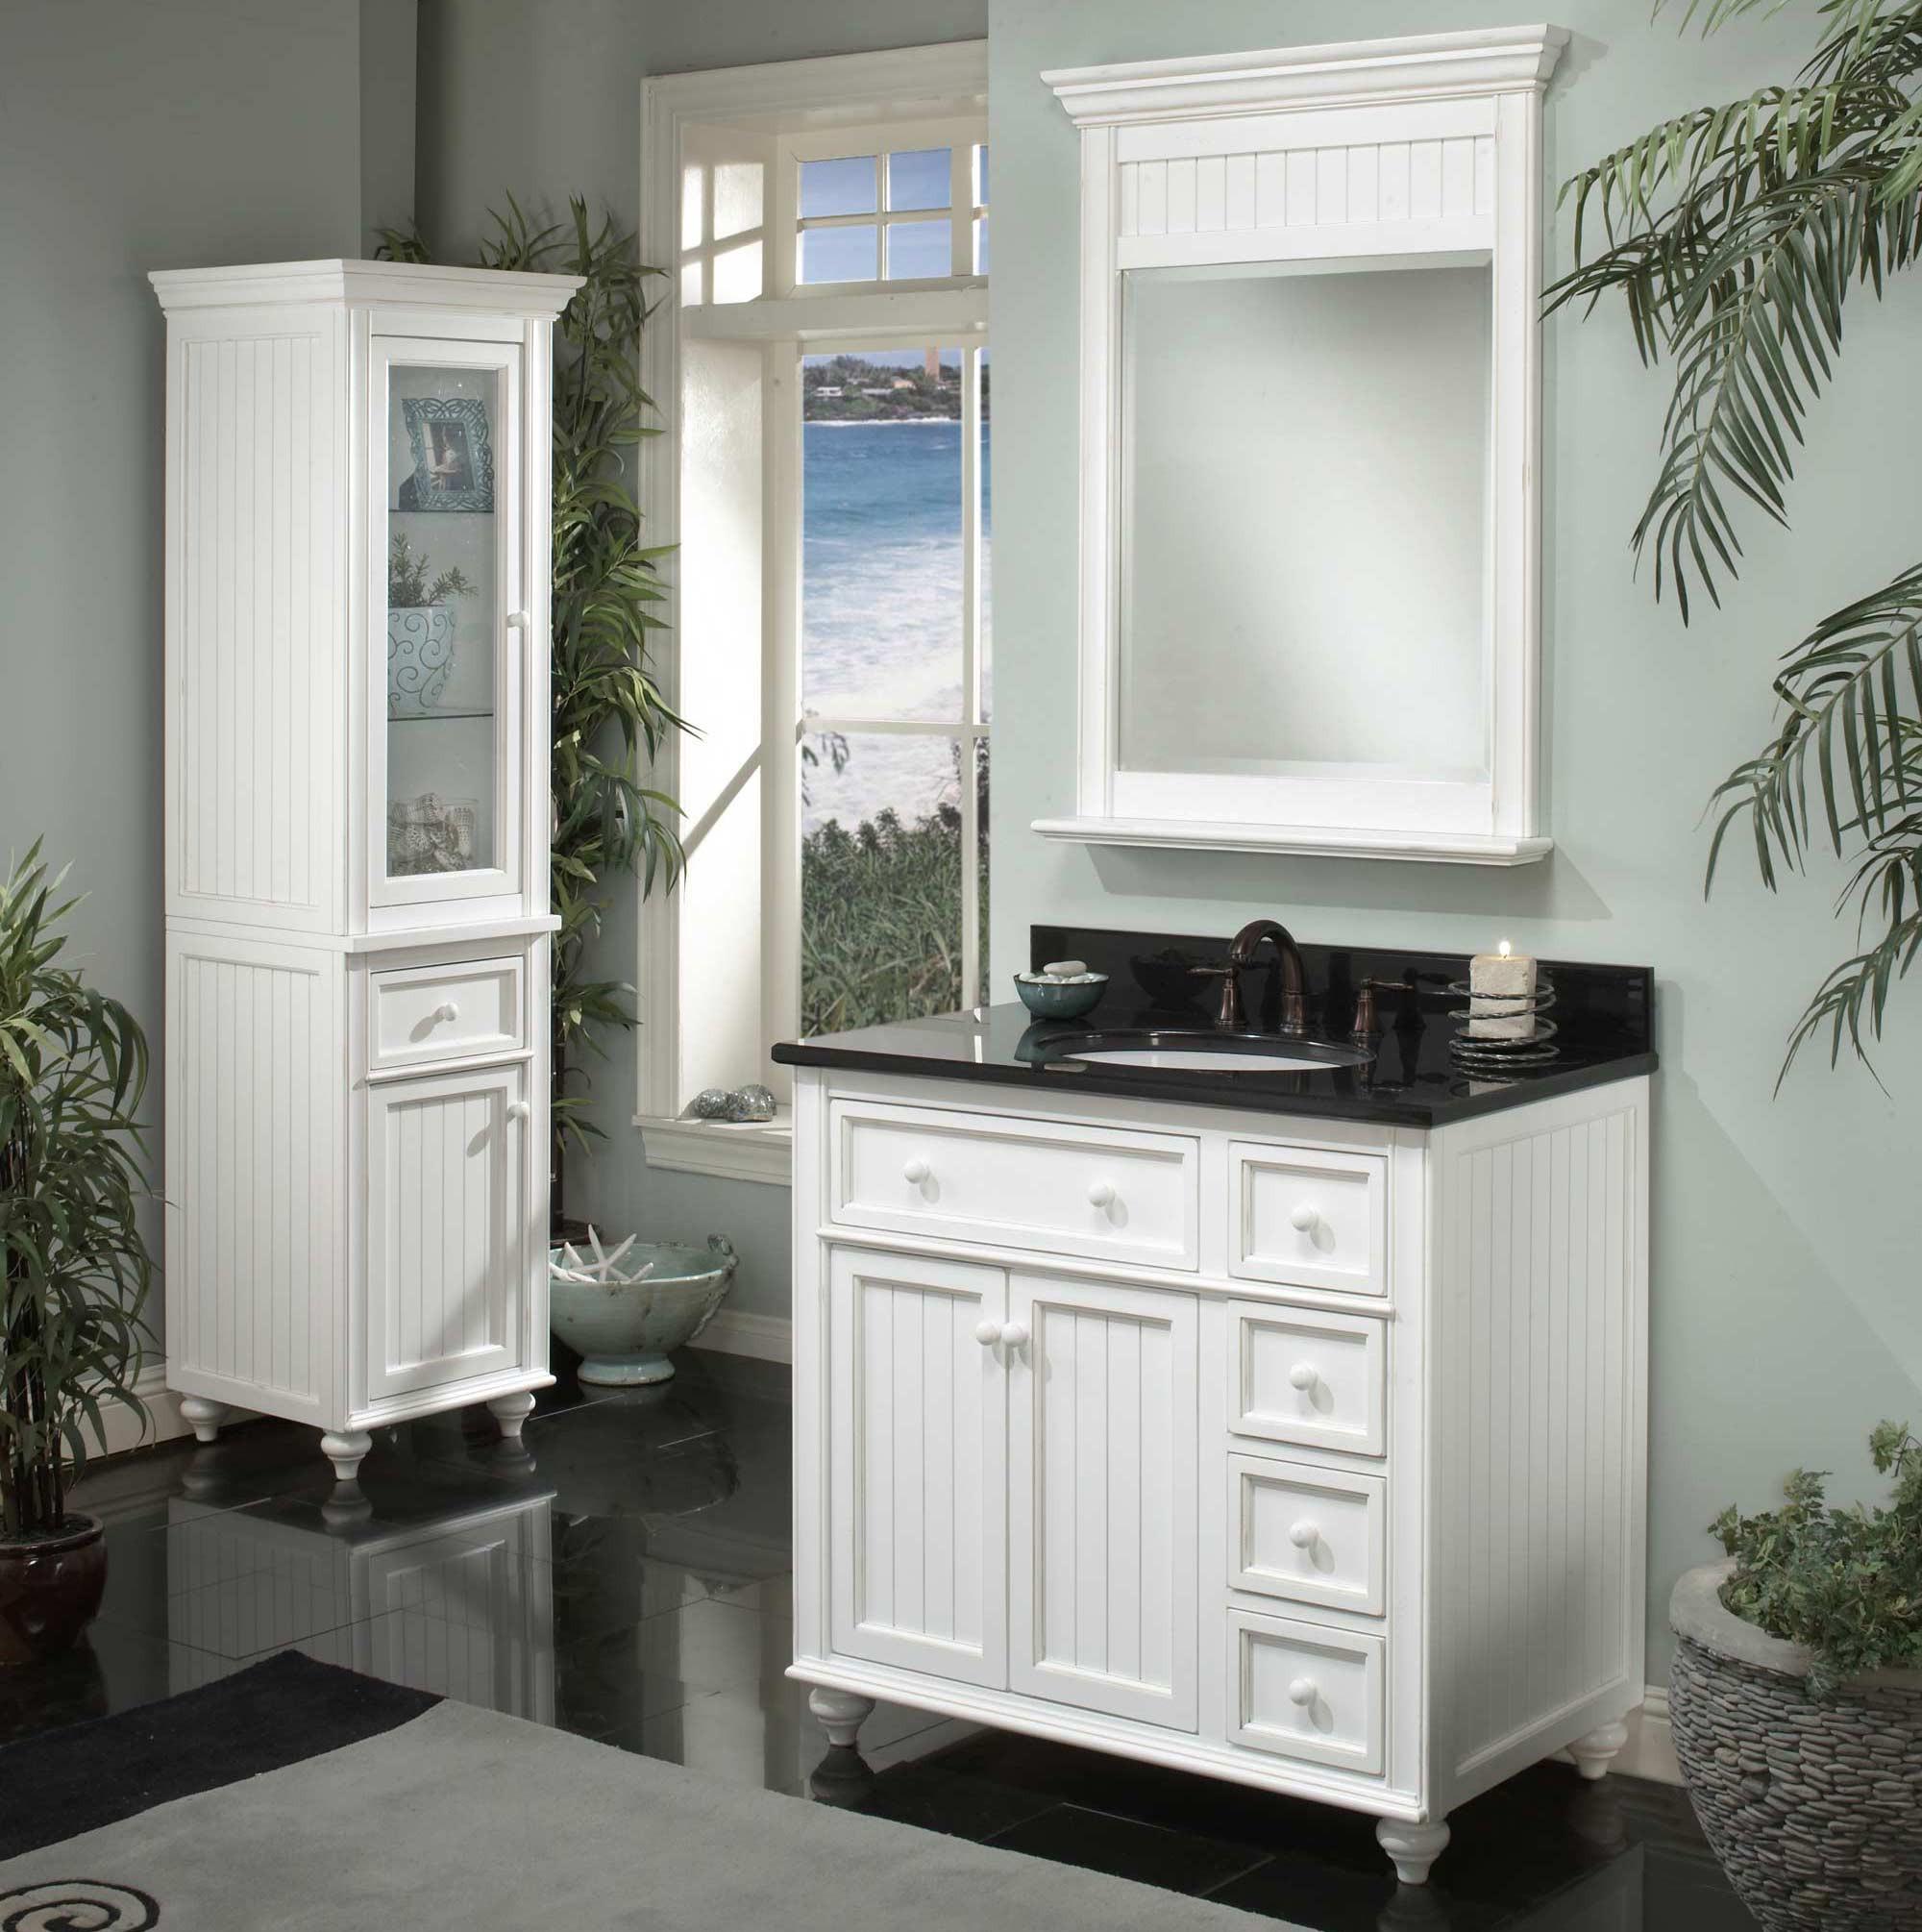 Bathroom Vanity Designs  A Selection of White Bathroom Vanities by Sagehill Designs